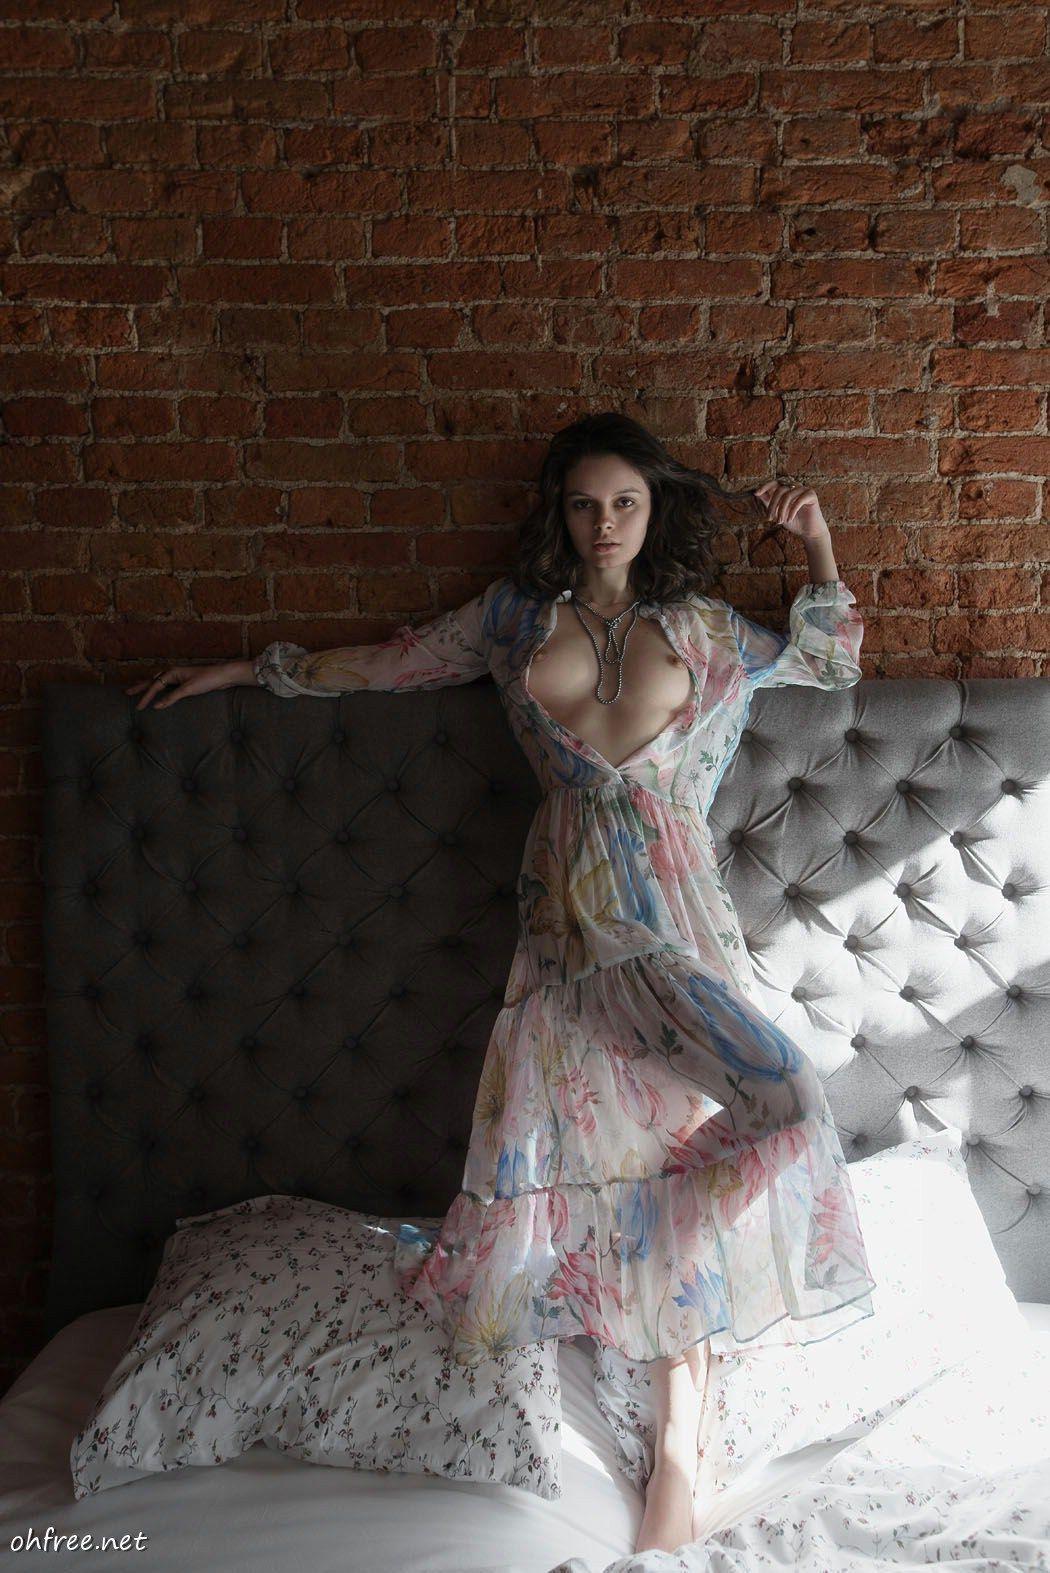 Julia Liepa hot nudes (44 photos), Tits Celebrity photos